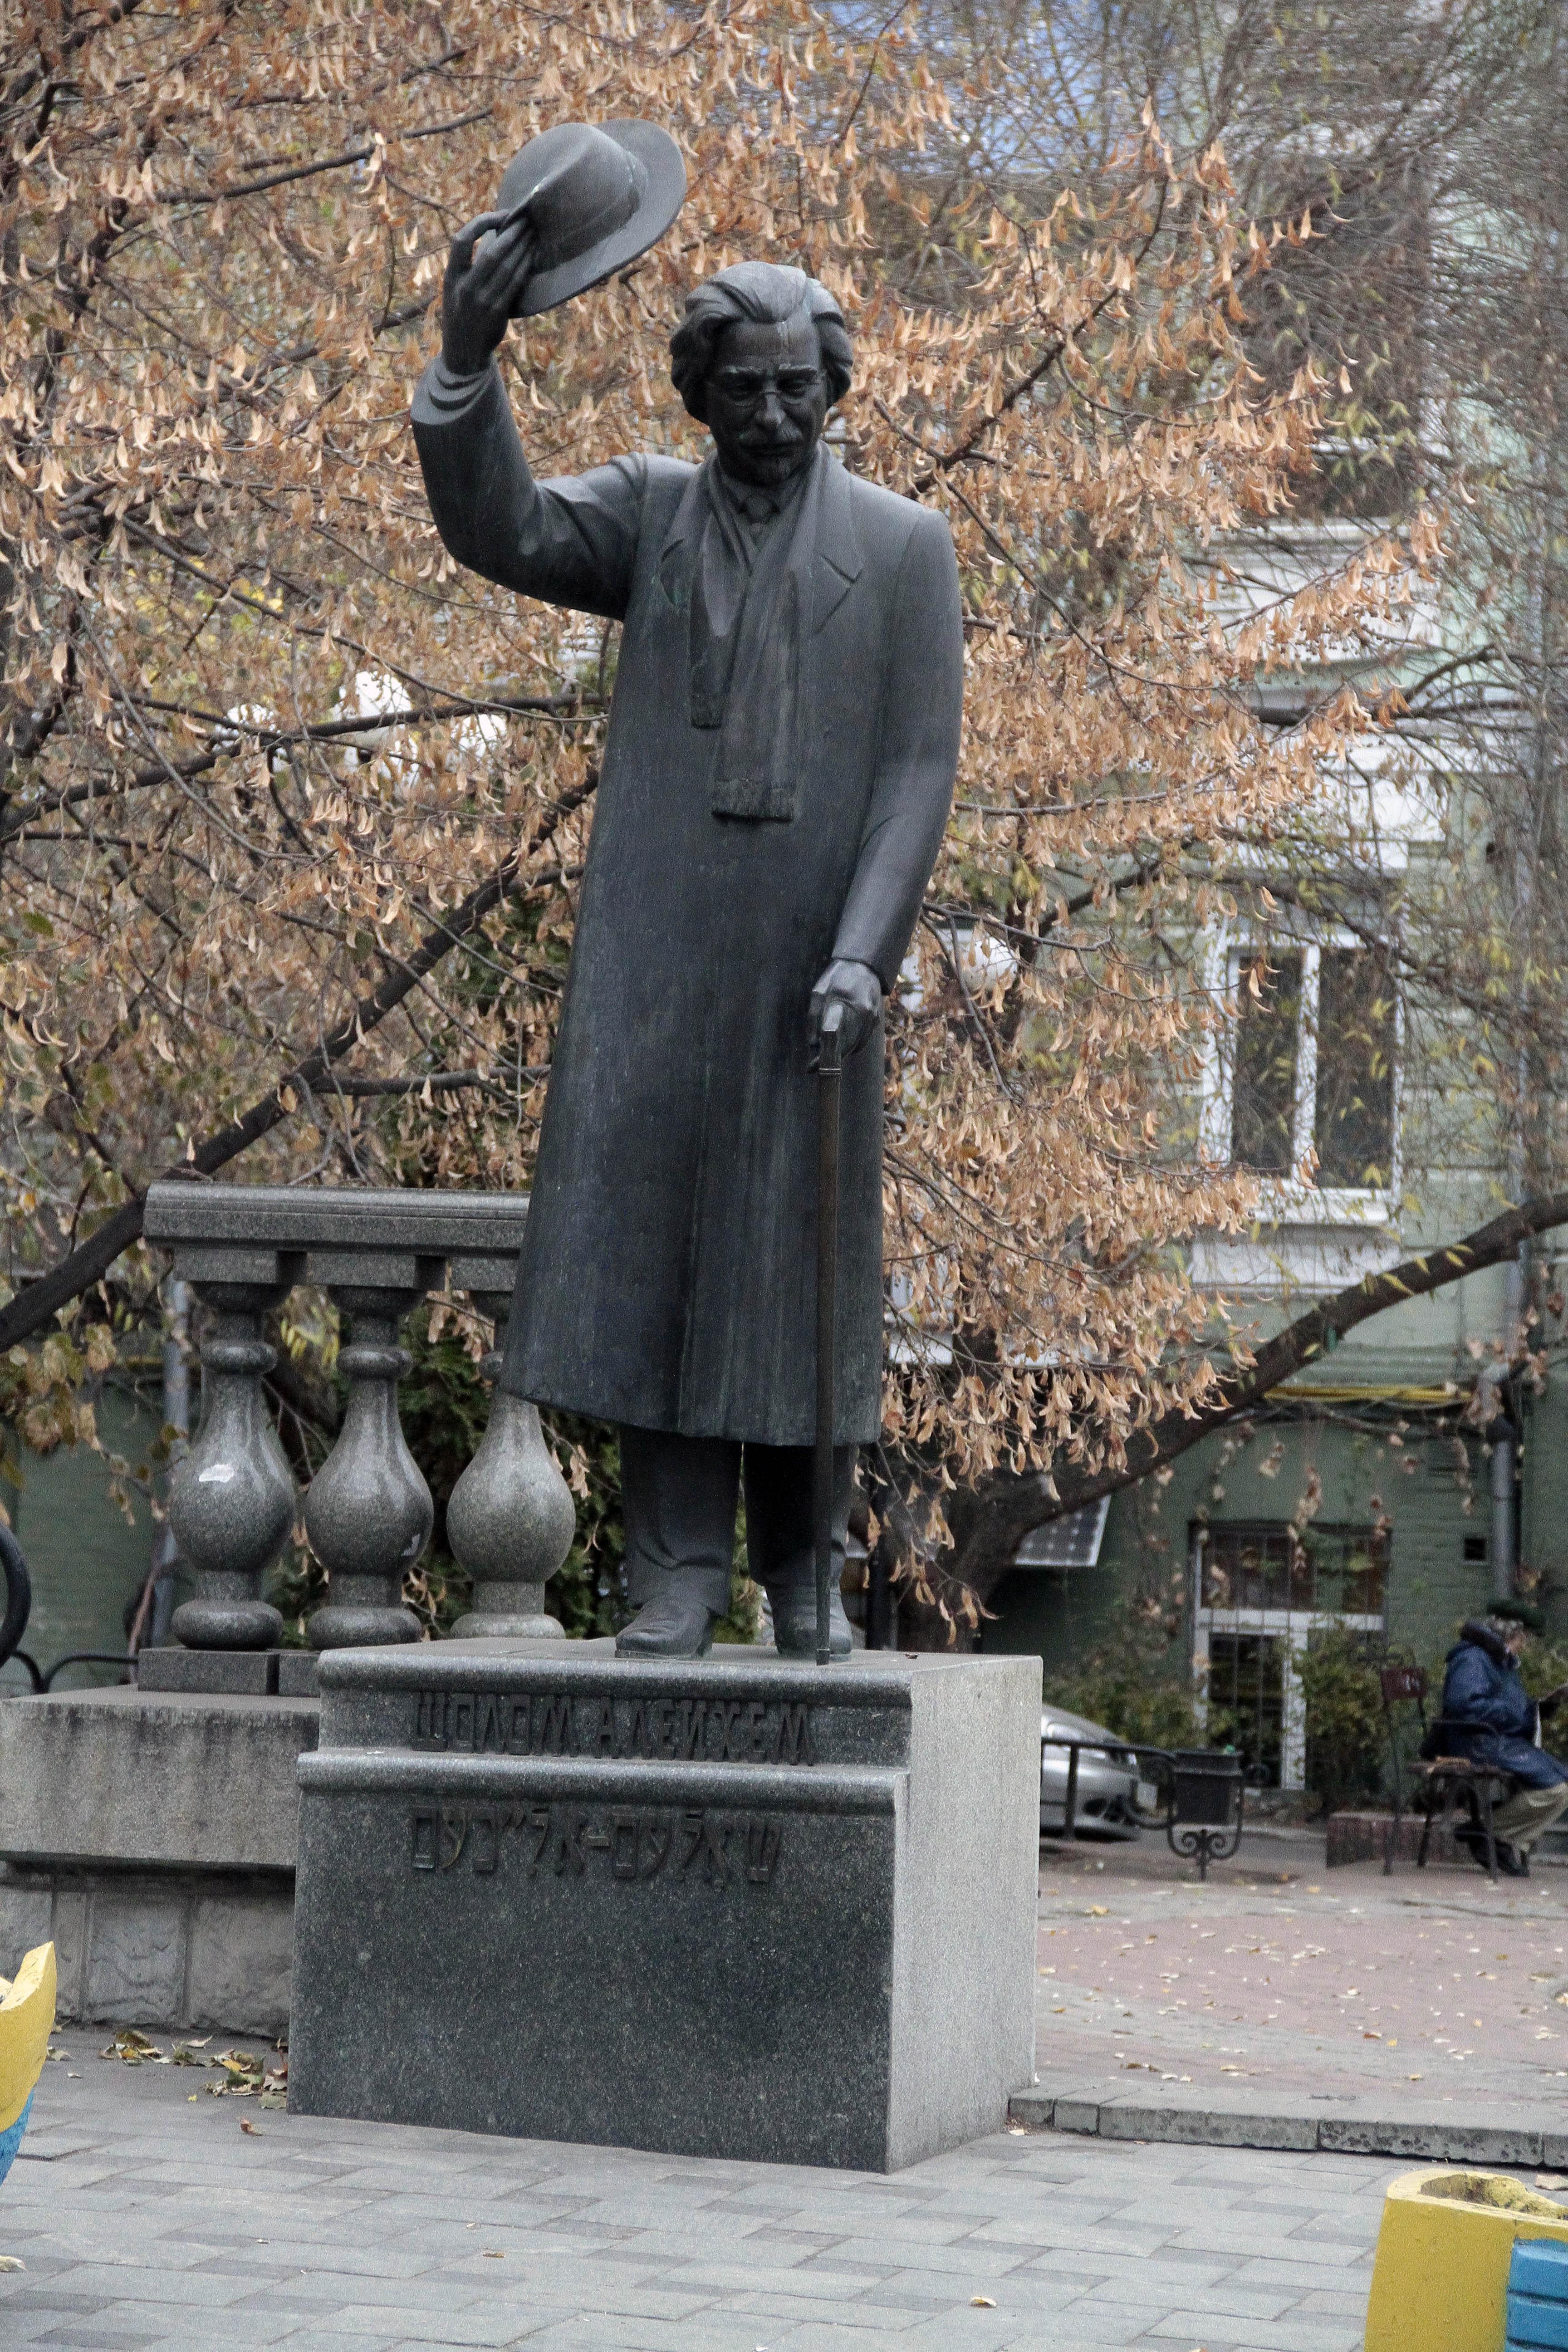 Купить памятник на кладбище 14 мая цена на памятники барнаул мрамора